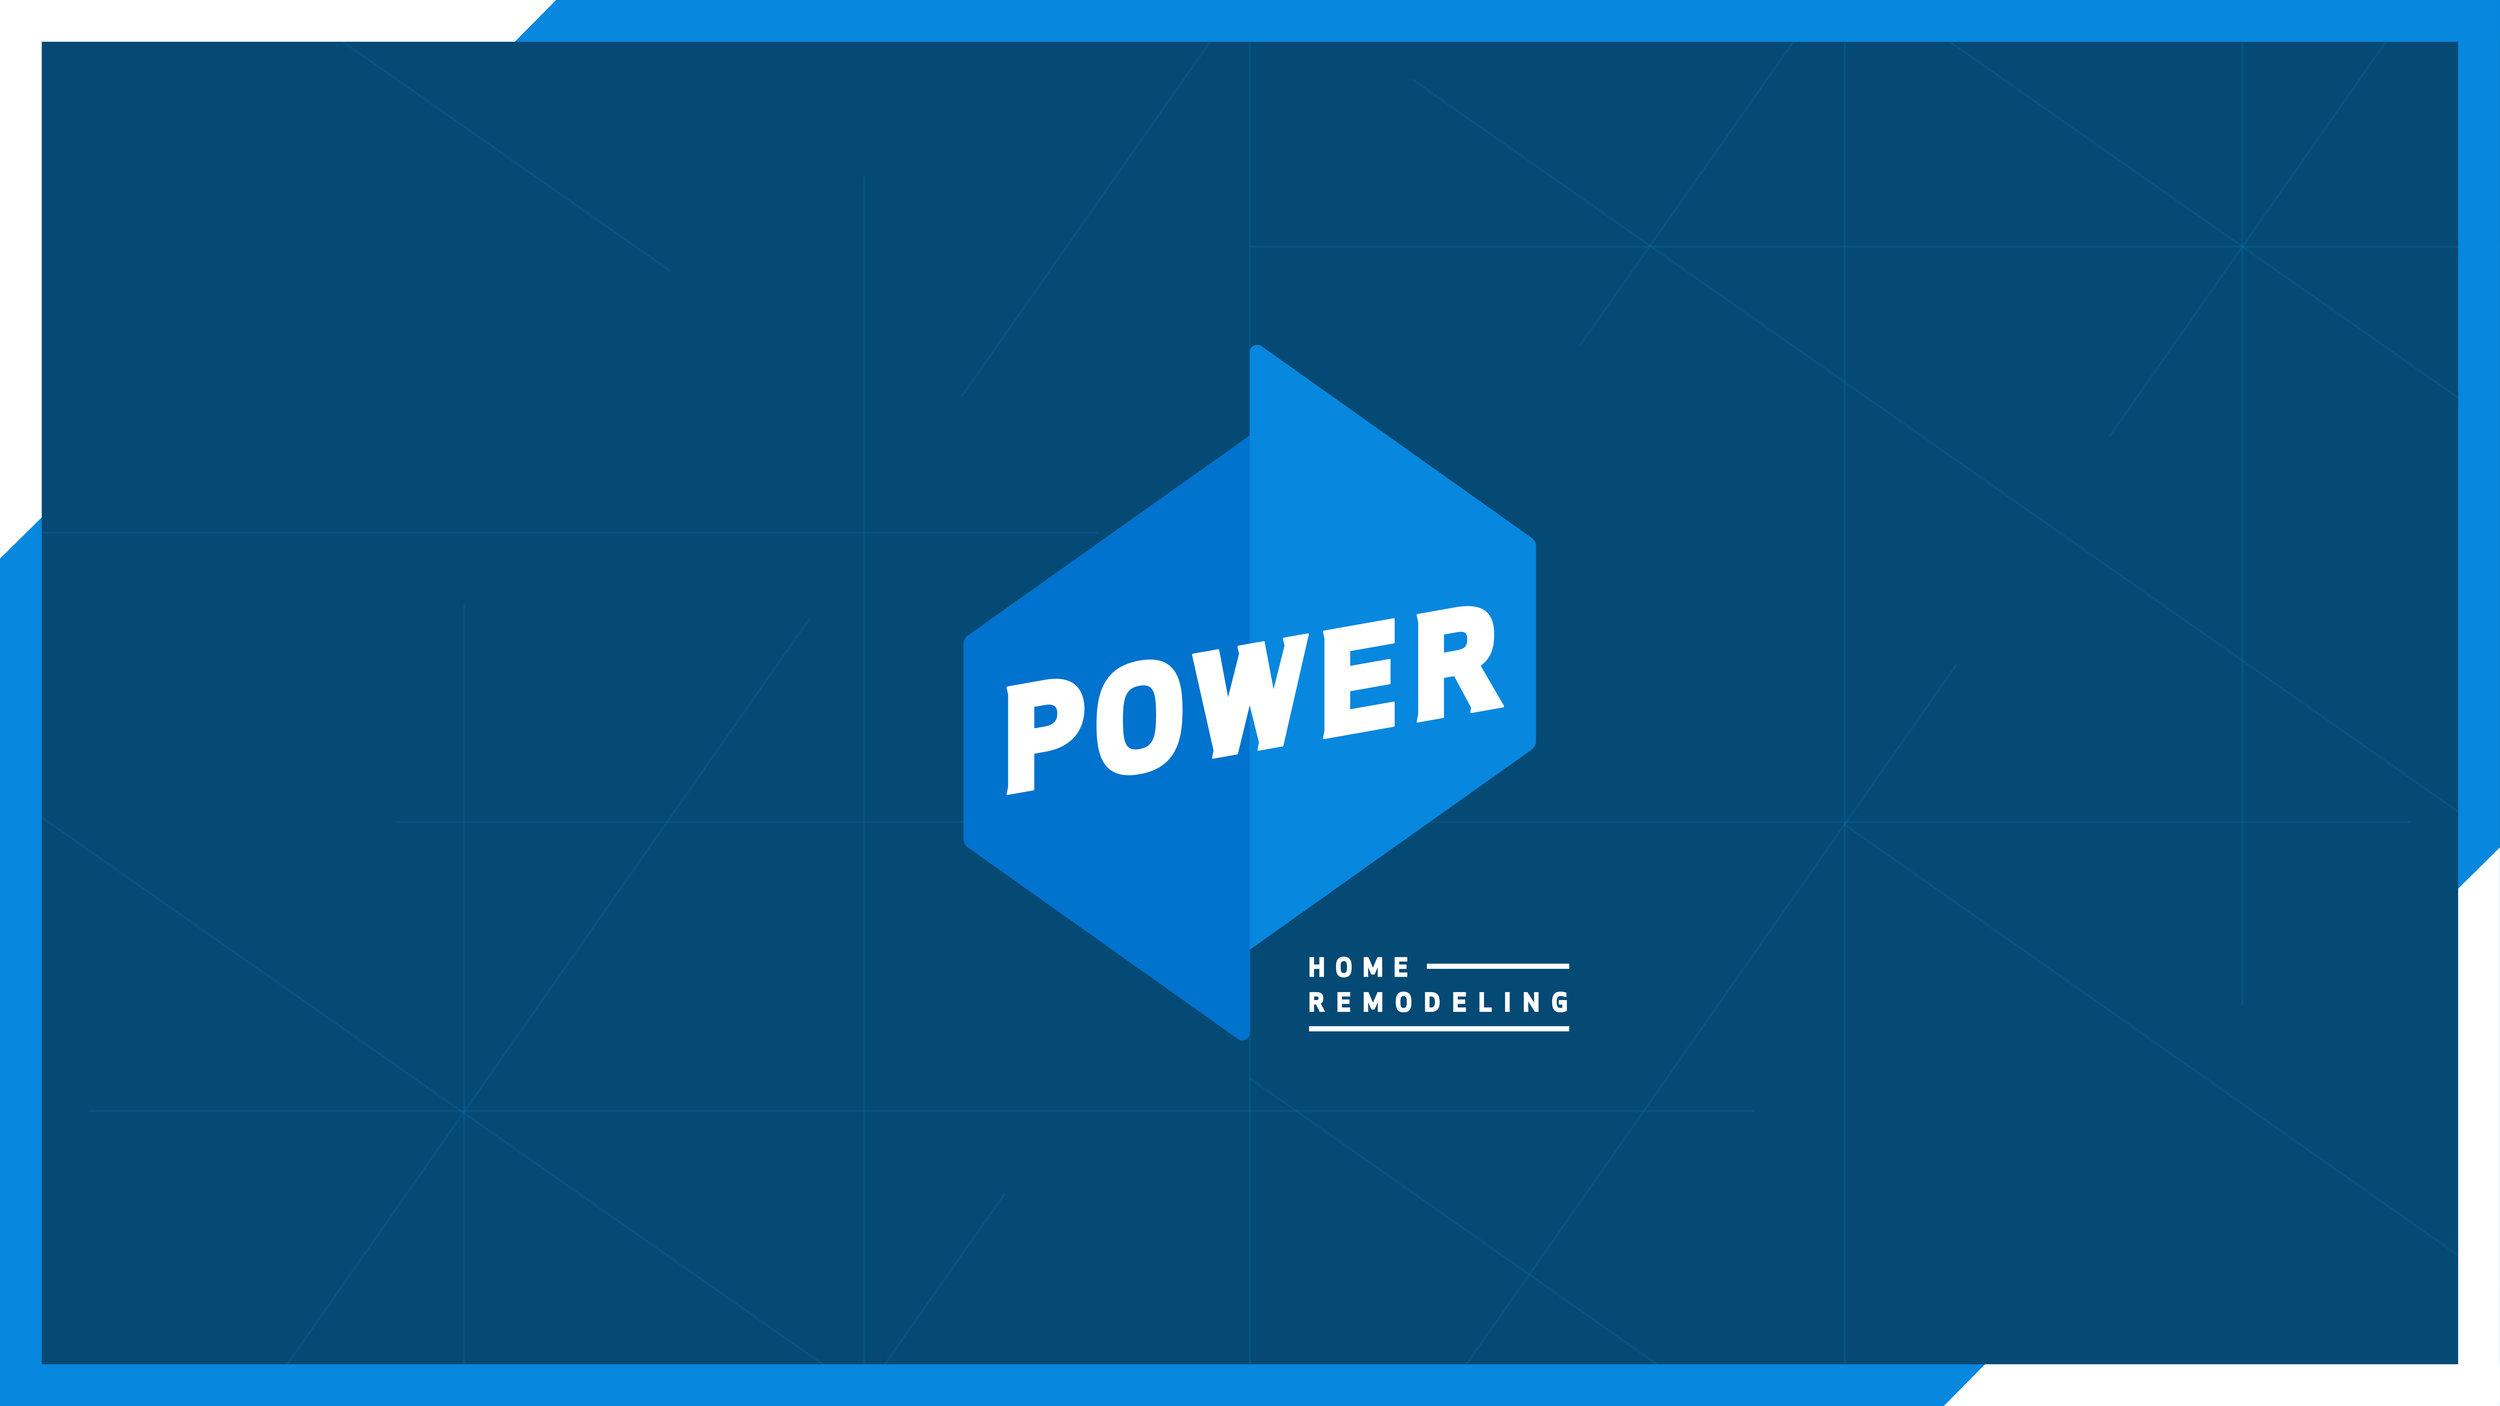 Power Home RemodelingMatthew Gribben Graphic Design. Home Remodeling Design. Home Design Ideas